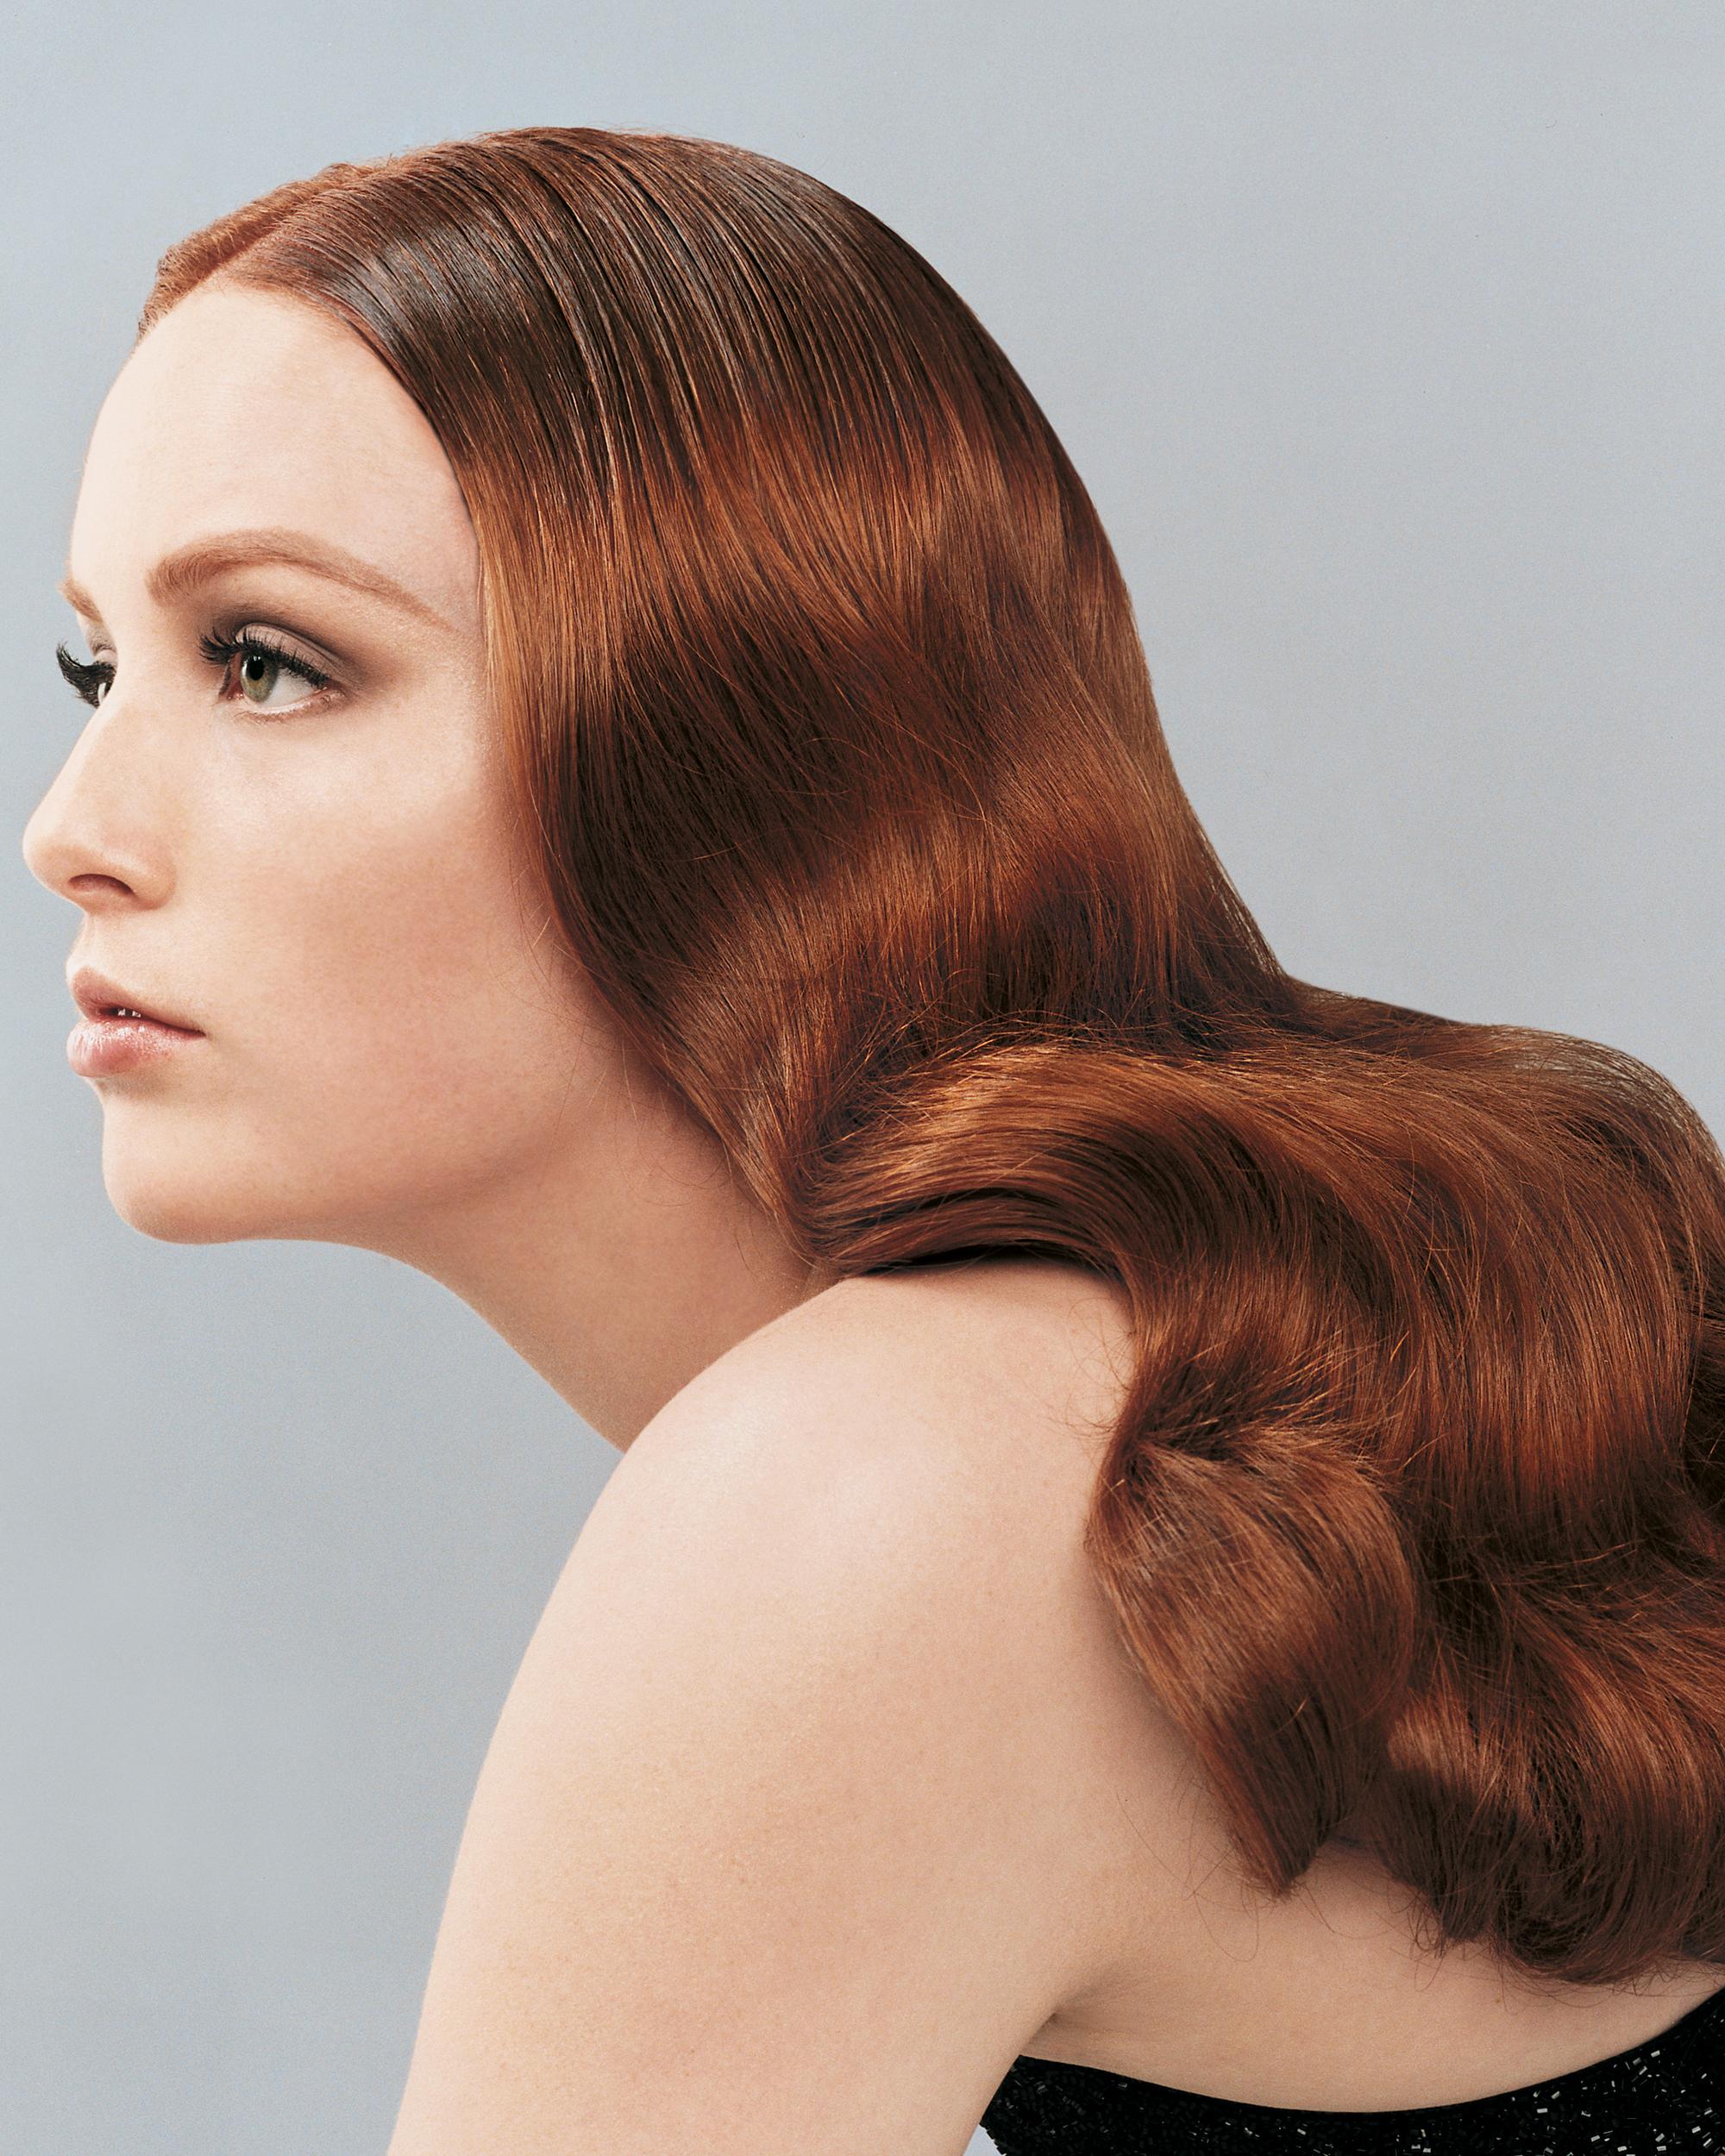 SachaJuan hair campaign shot in Stockholm  by Patrik Andersson